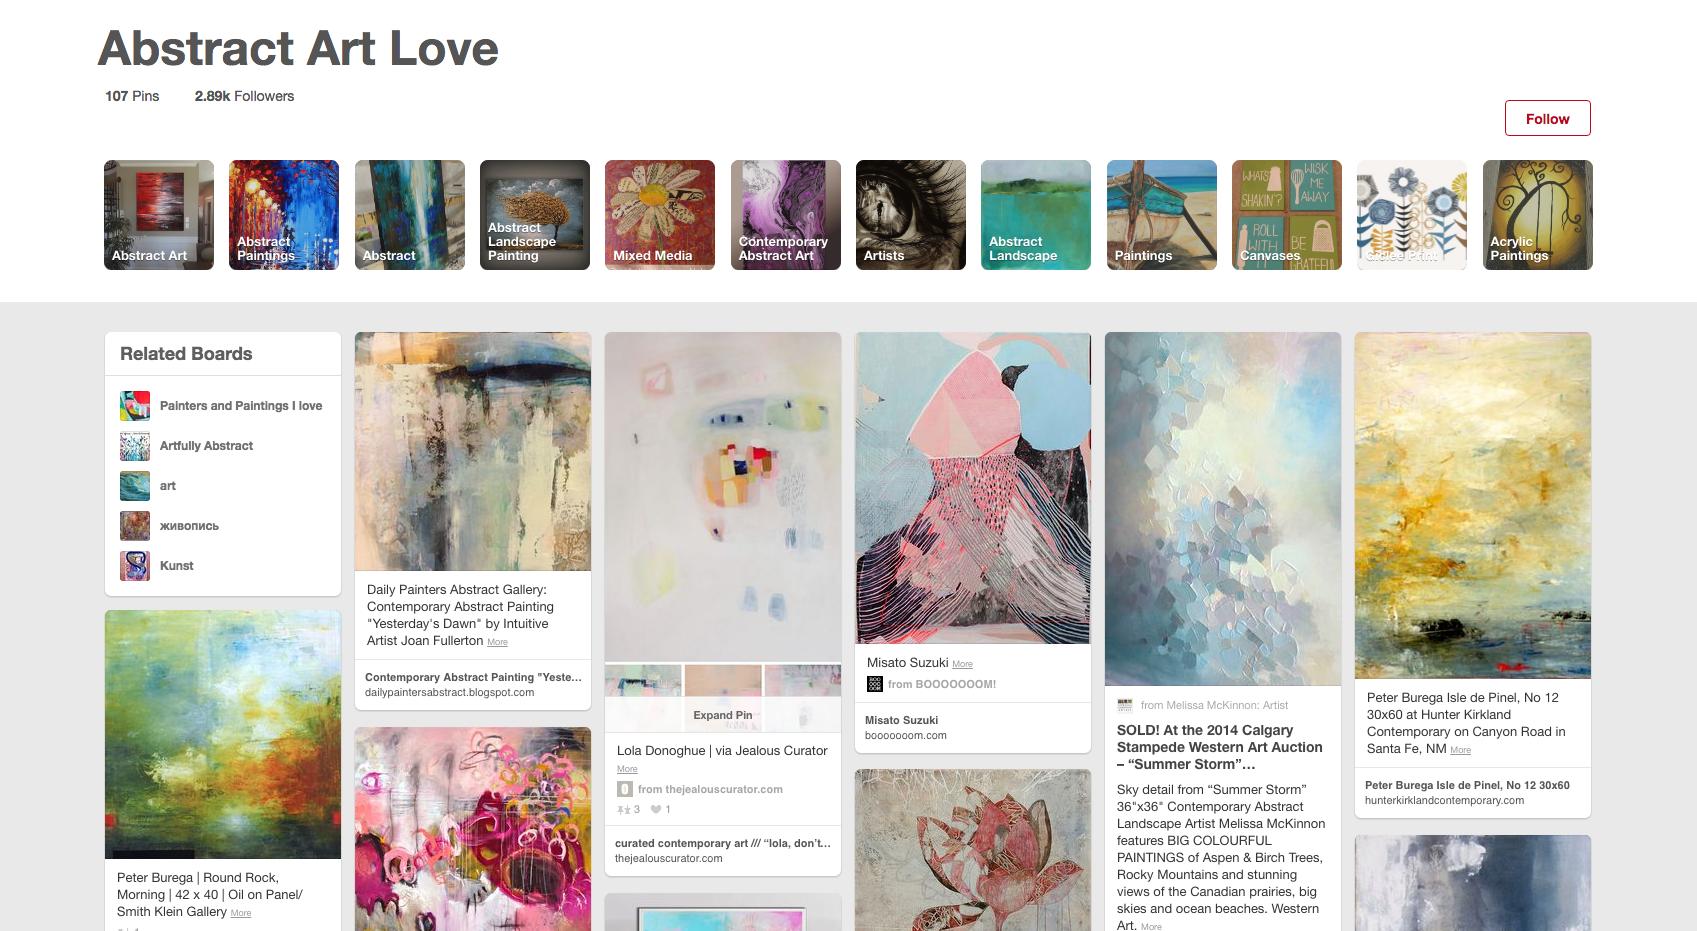 Abstract Art Love